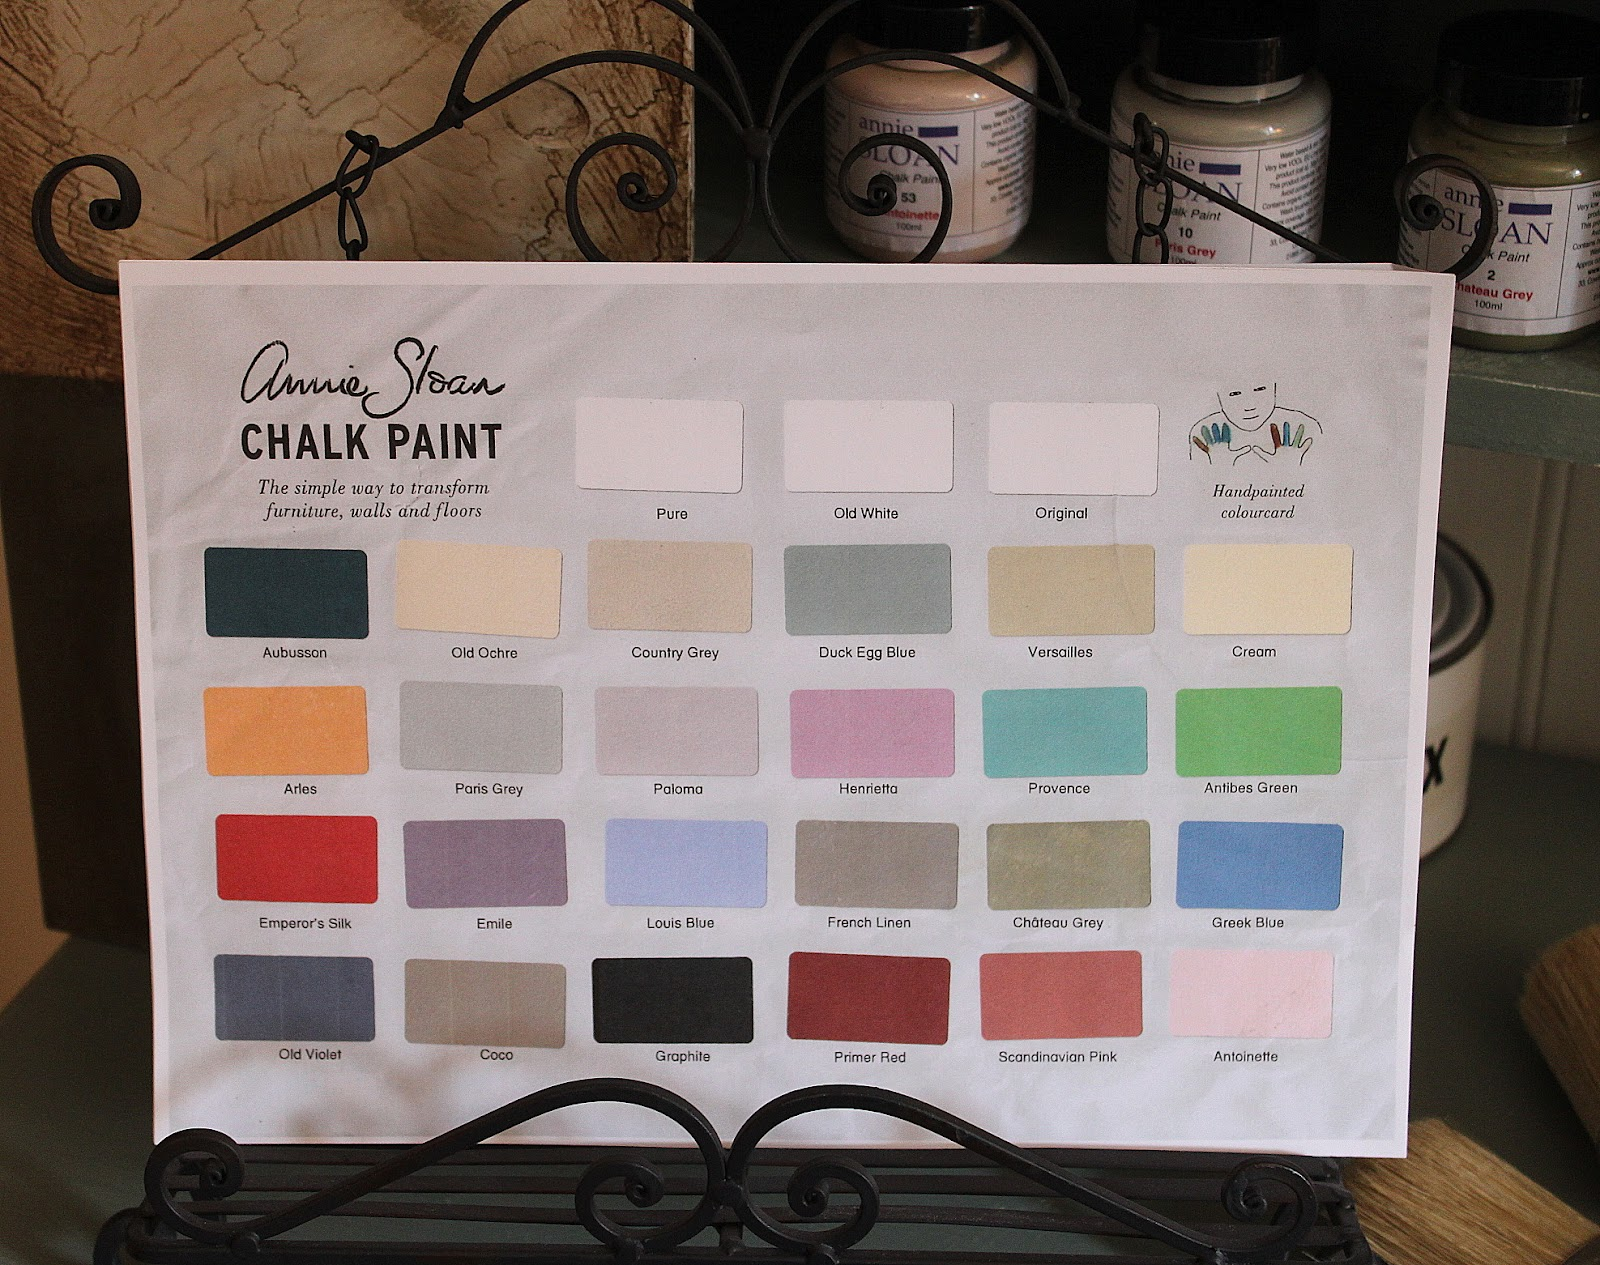 la vie en rose annie sloan paint fabrics wax brushes. Black Bedroom Furniture Sets. Home Design Ideas